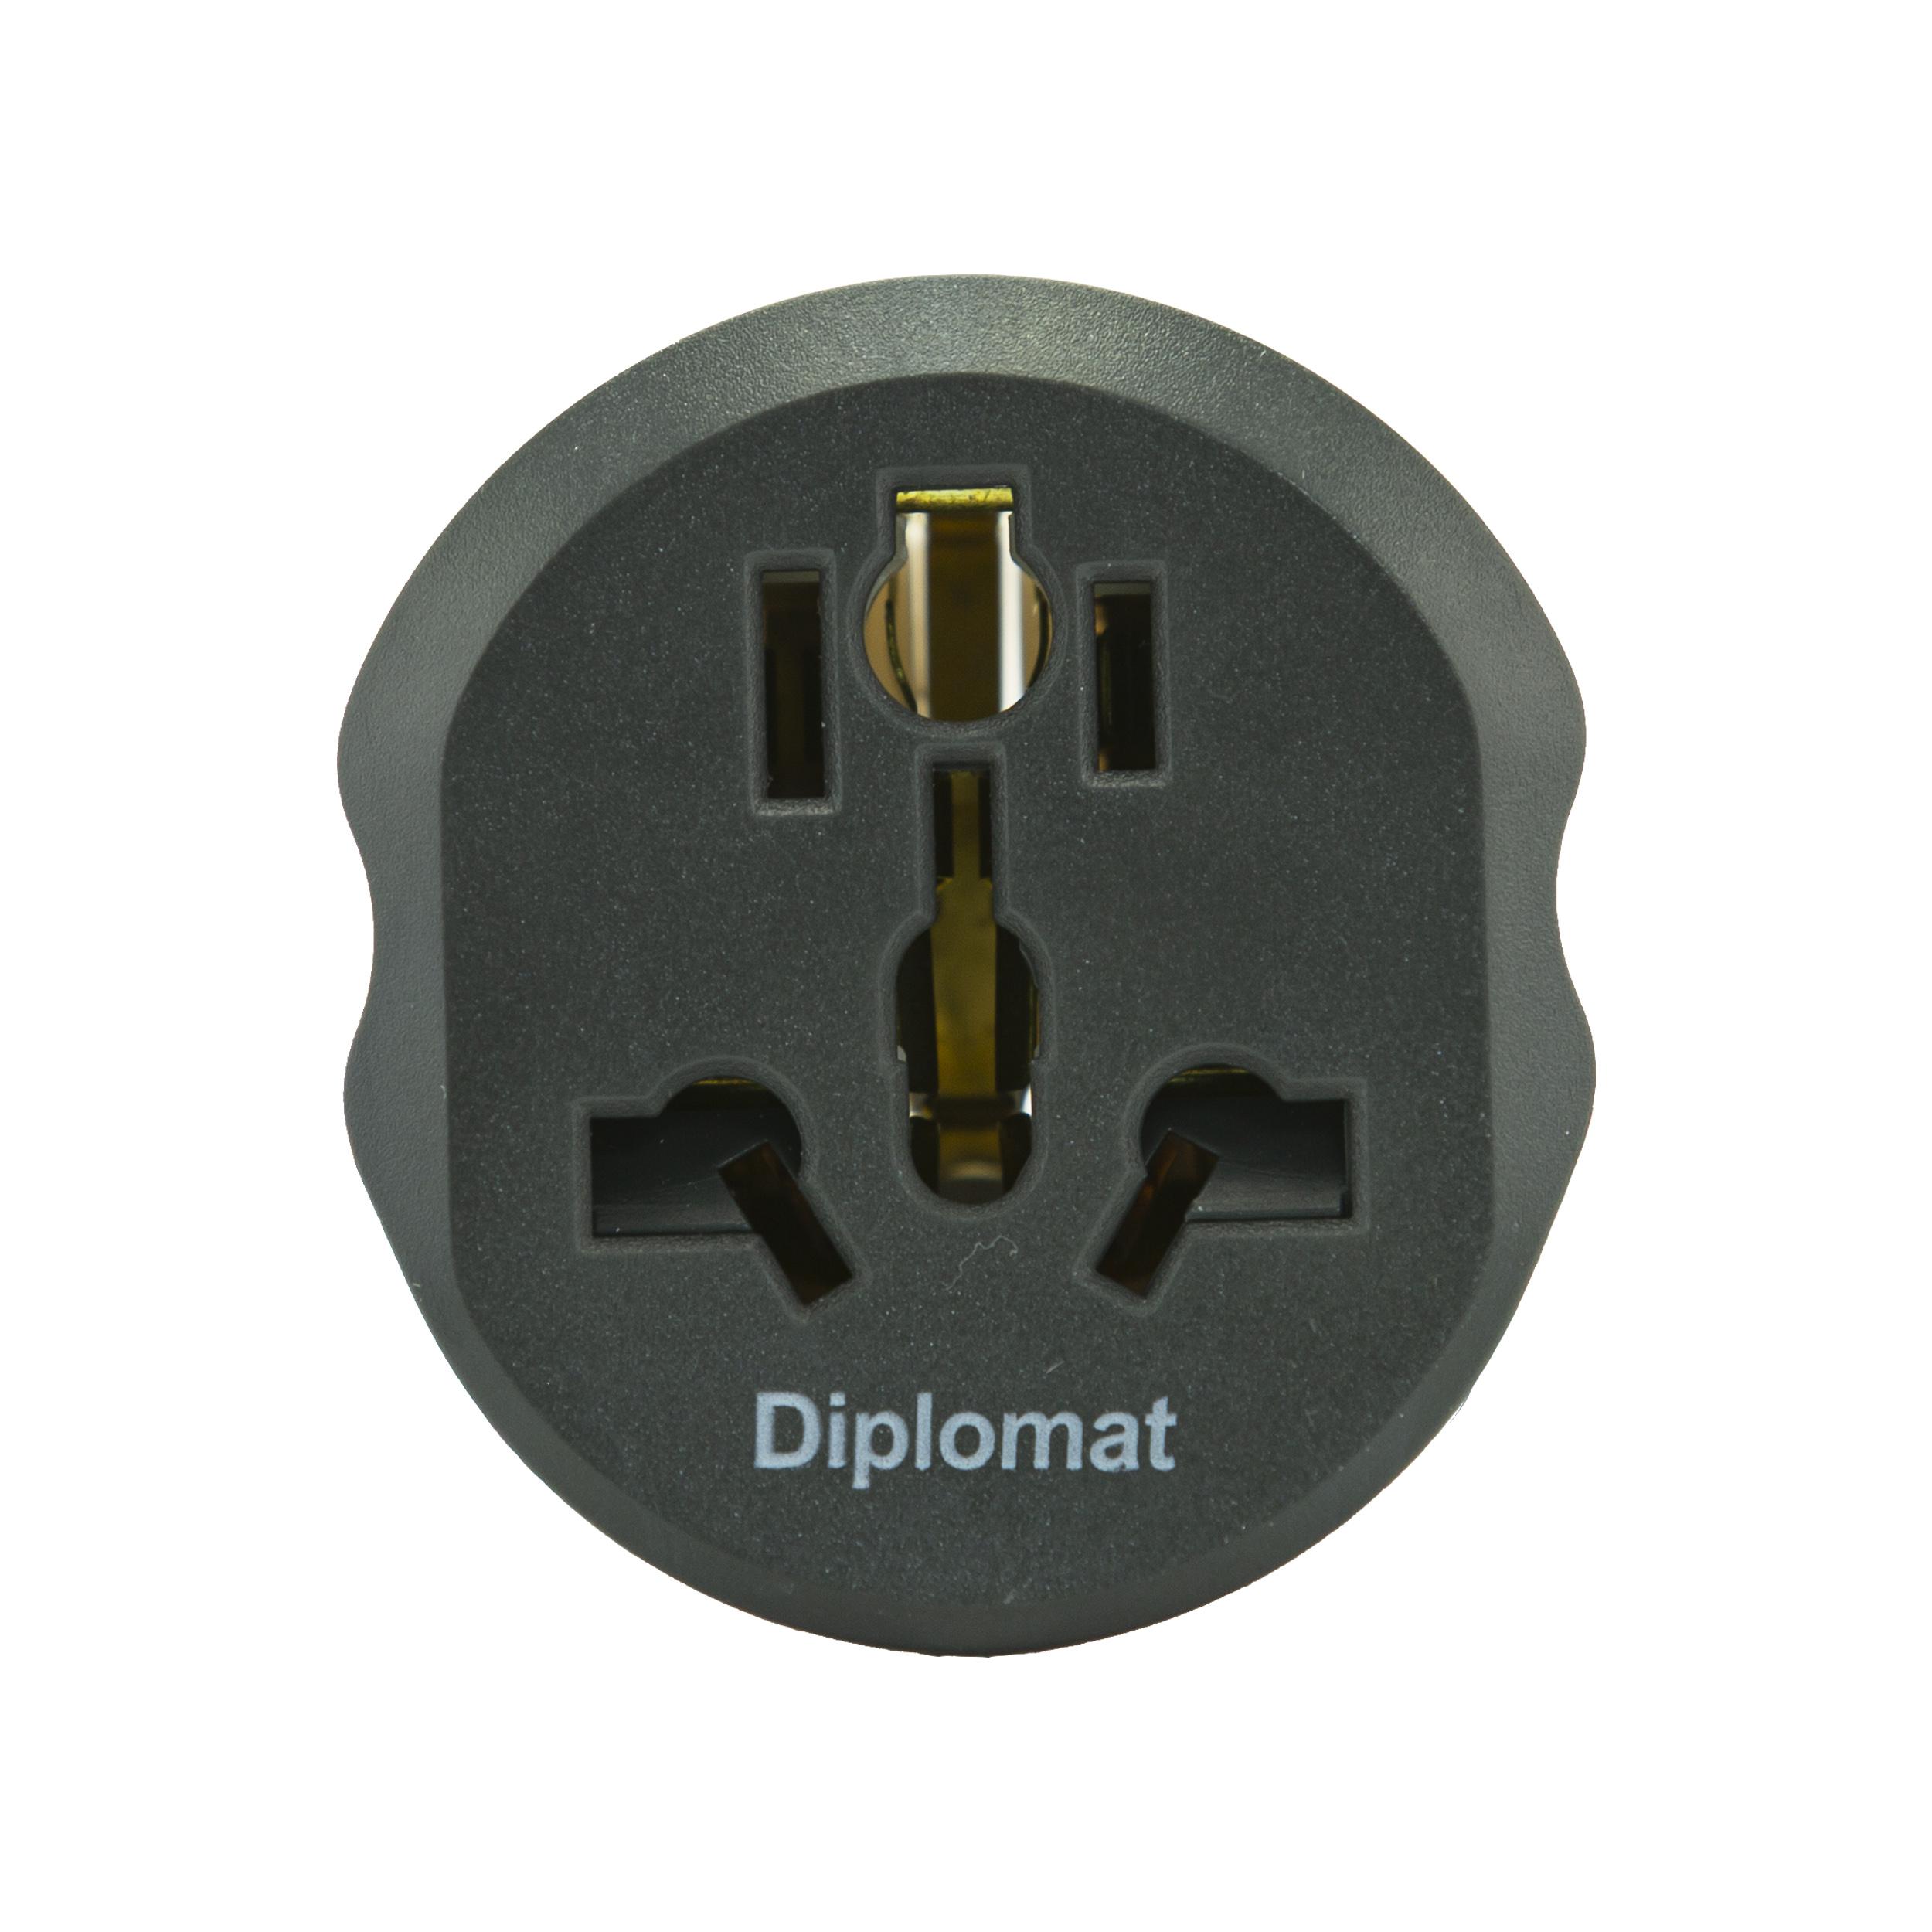 مبدل برق دیپلمات کد 056